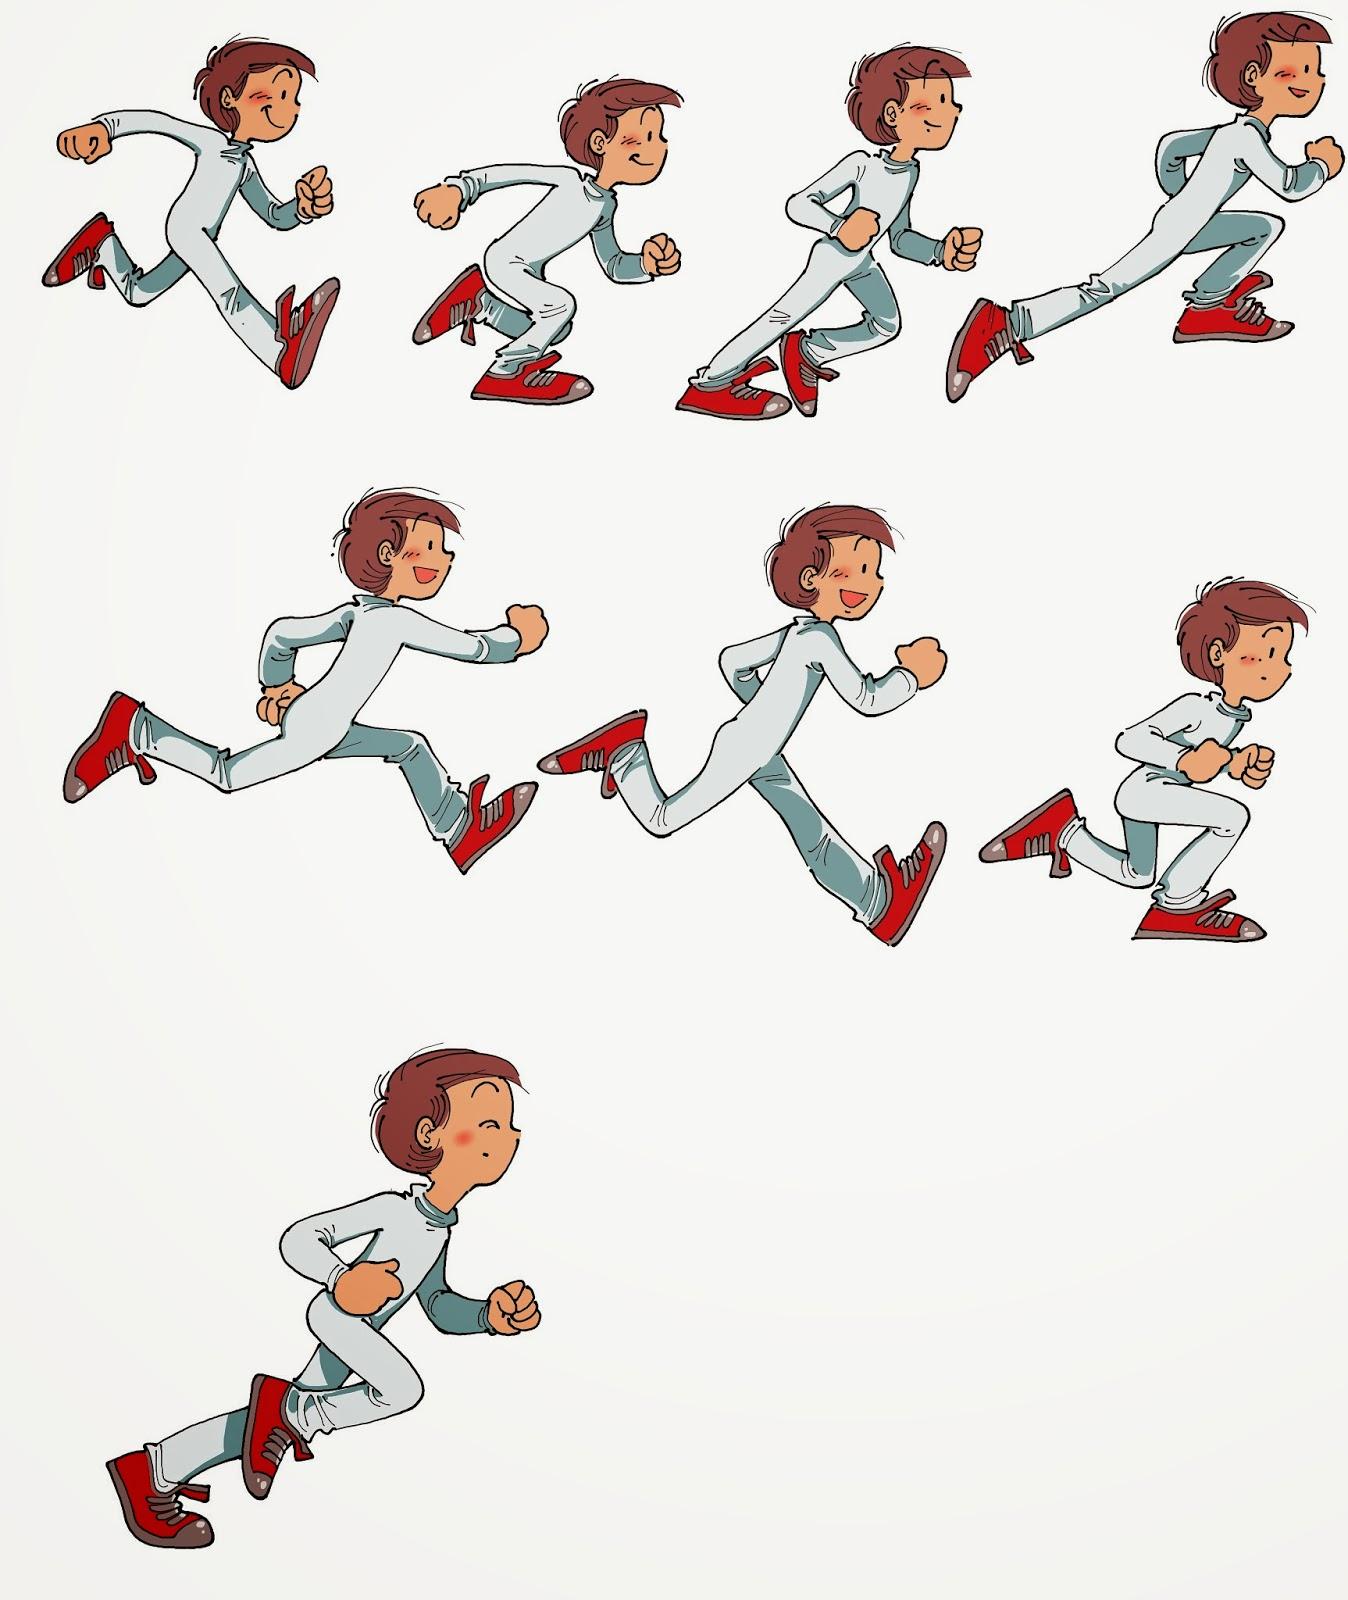 Imagenes de correr caricatura imagui for Imagenes de animacion